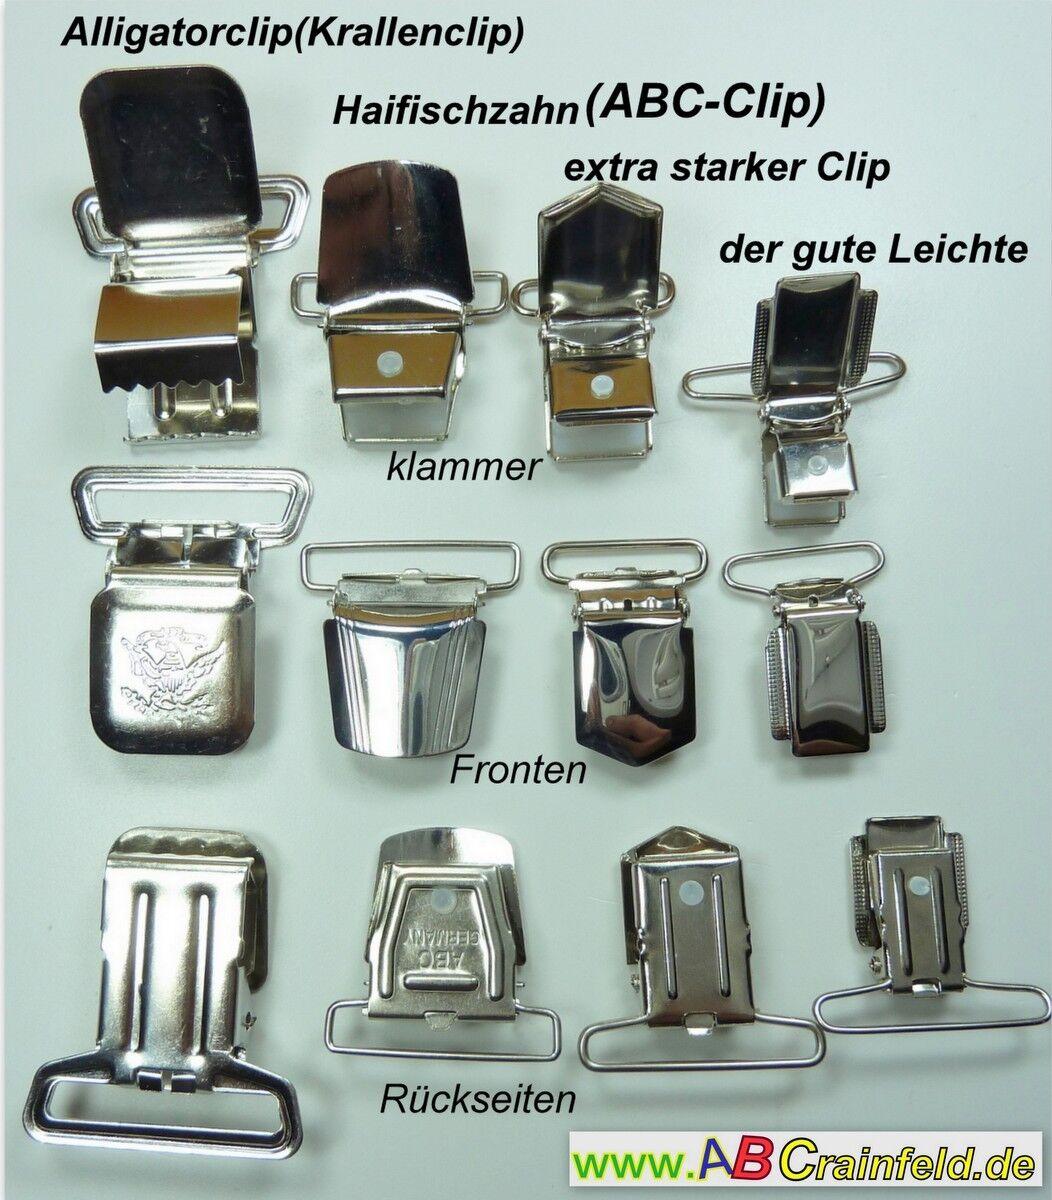 Diverse Diverse Diverse Hosenträgerclips, Klip, Krallenklip, Krokodilklip, ABC-Clip,Blitzversand | Überlegene Qualität  d810ab